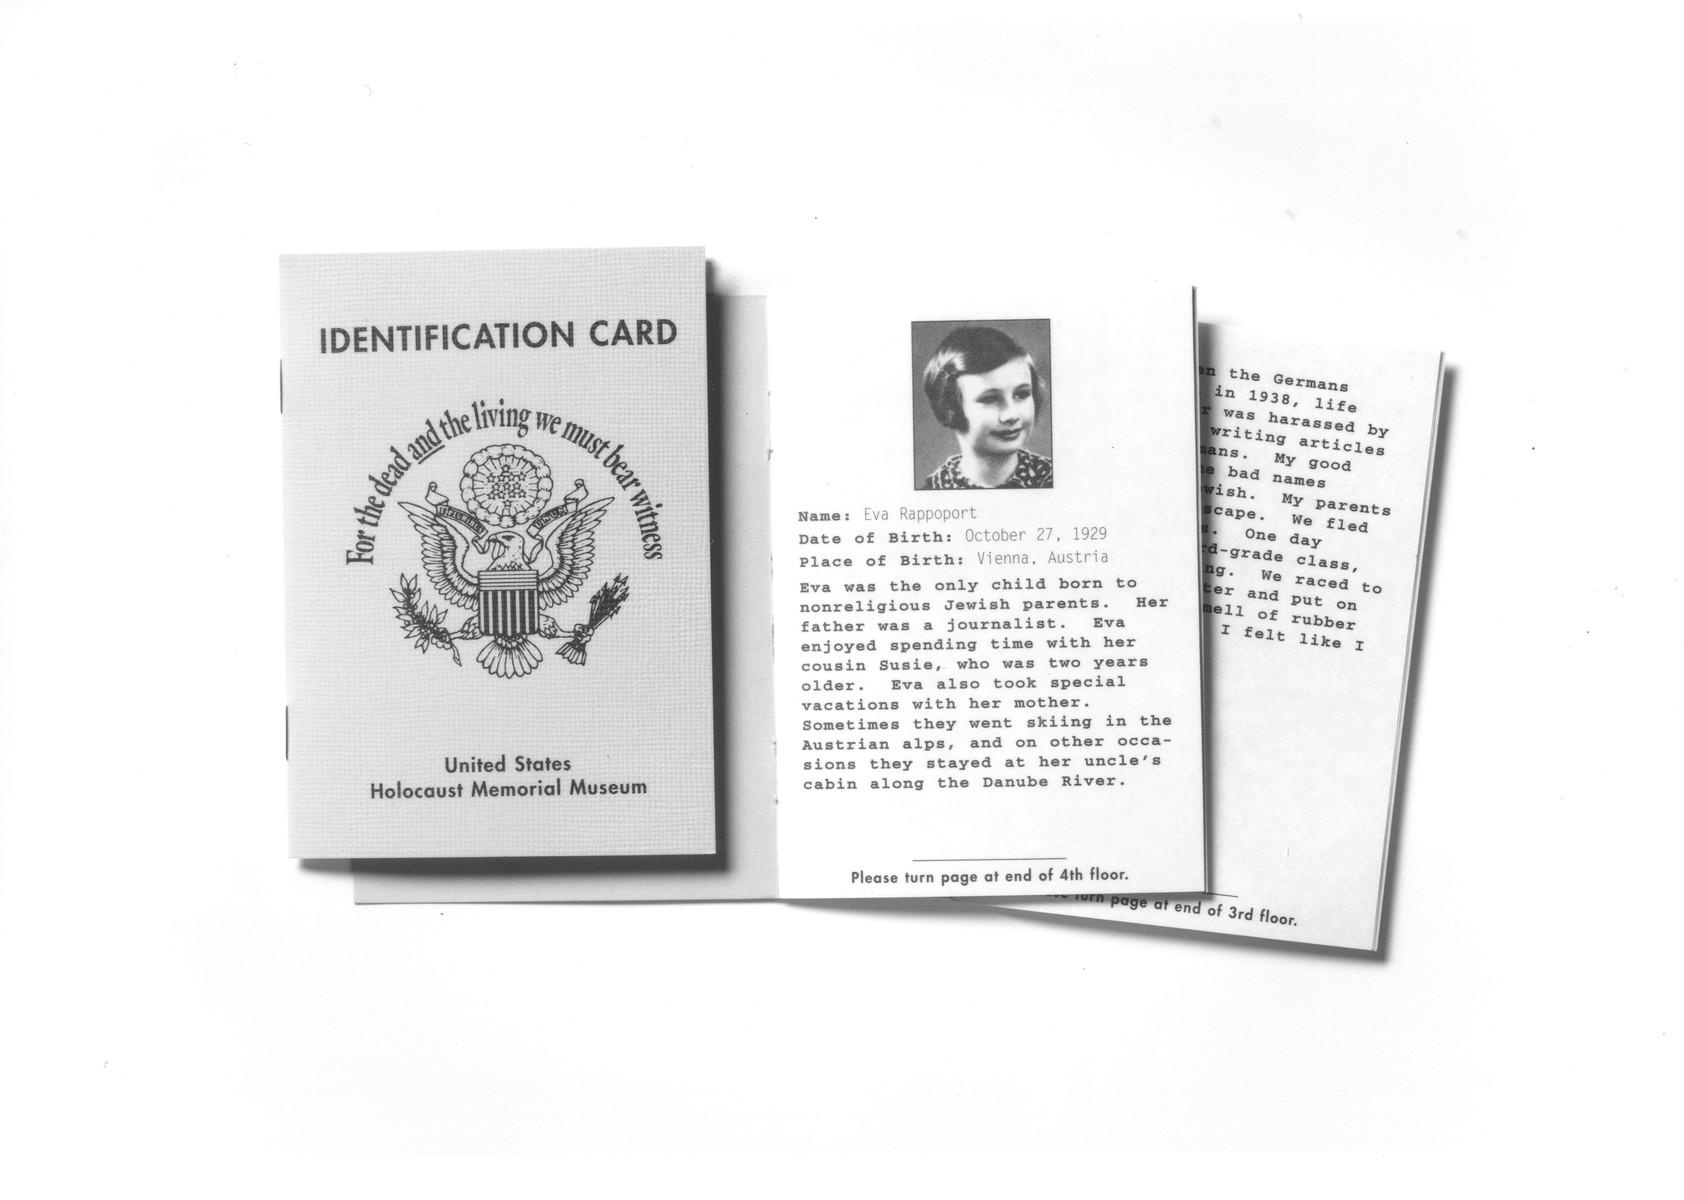 U.S. Holocaust Memorial Museum identification card for Eva Rappoport.